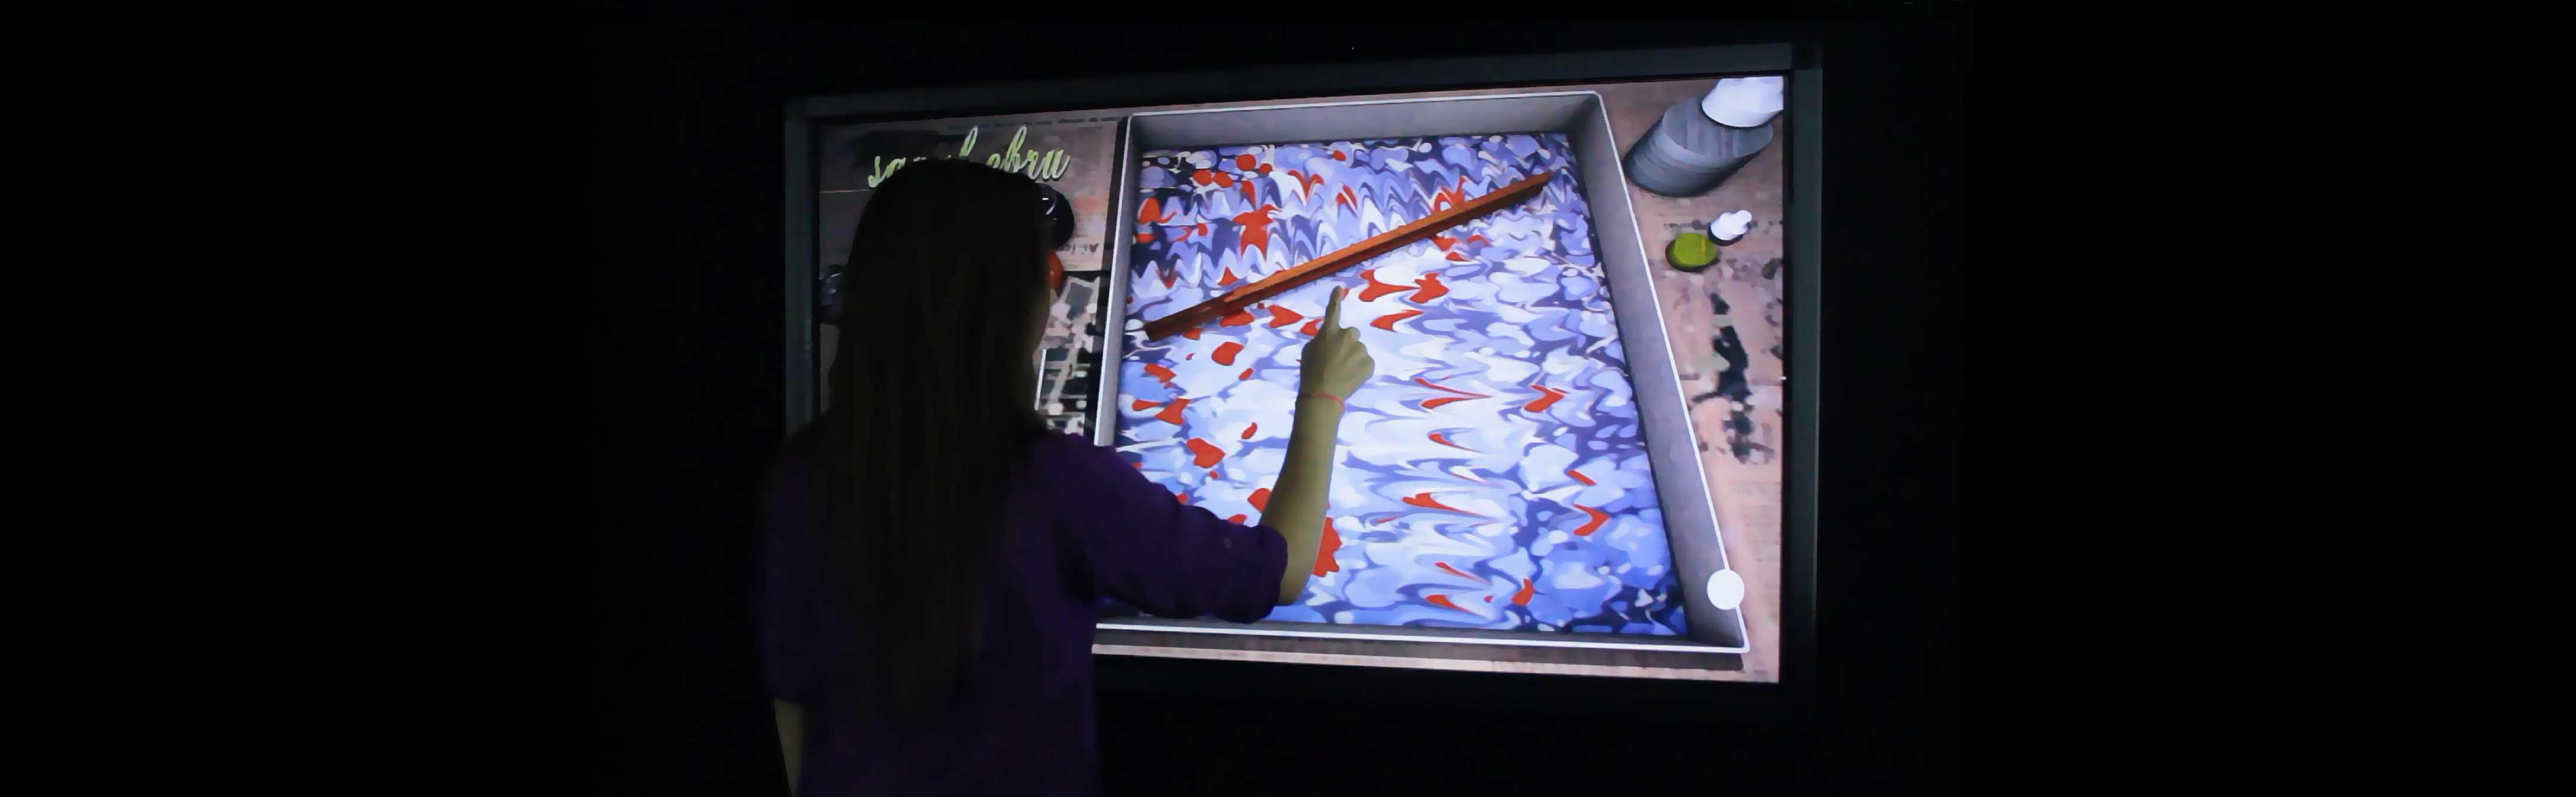 Virtual Marbling Studio